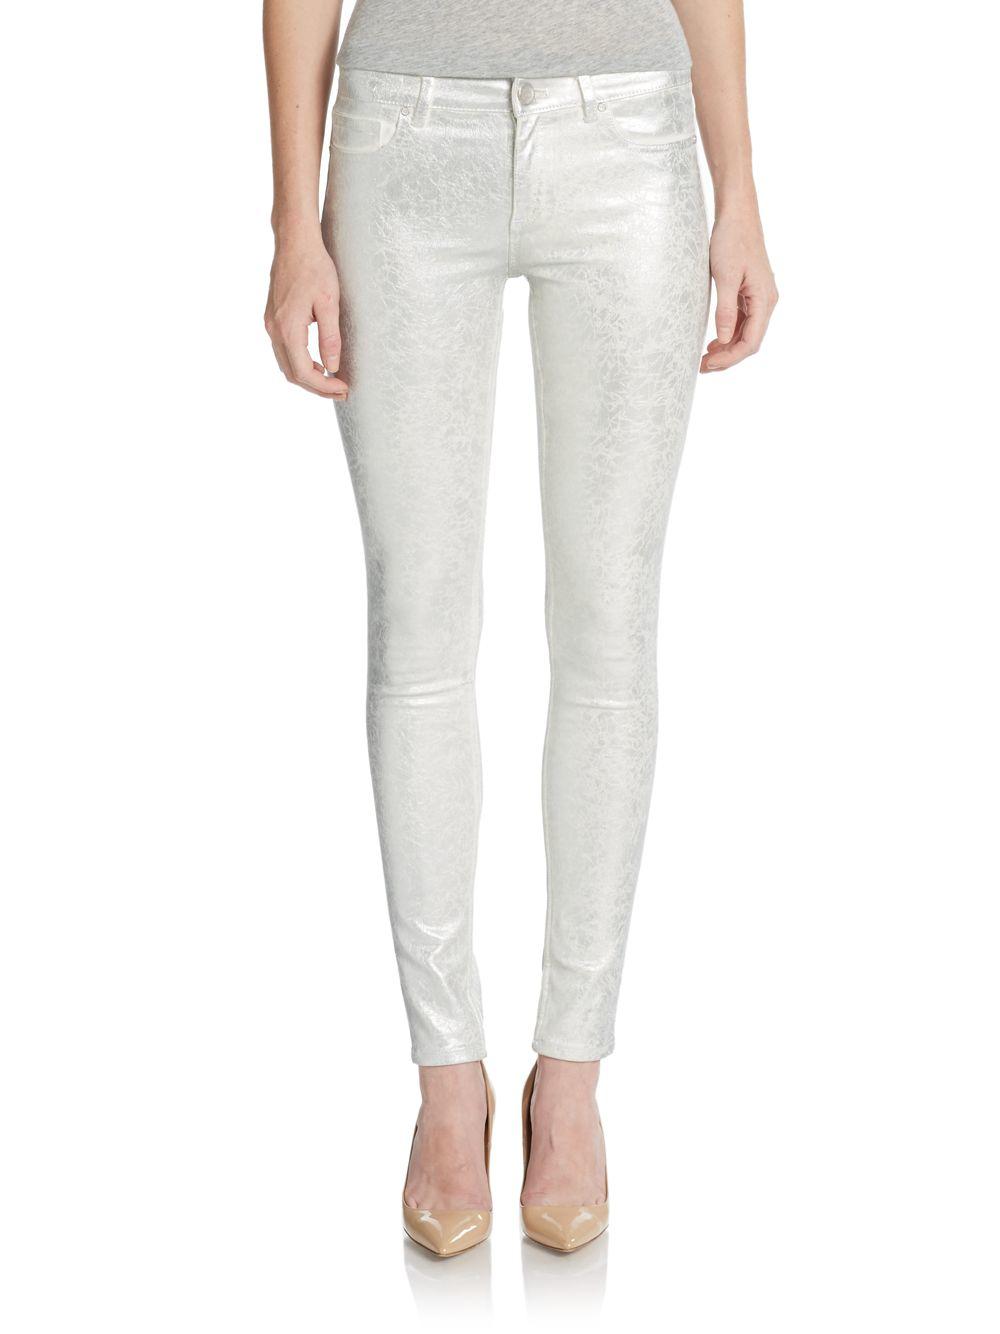 Elie tahari Azella Coated Metallic Skinny Jeans in White | Lyst